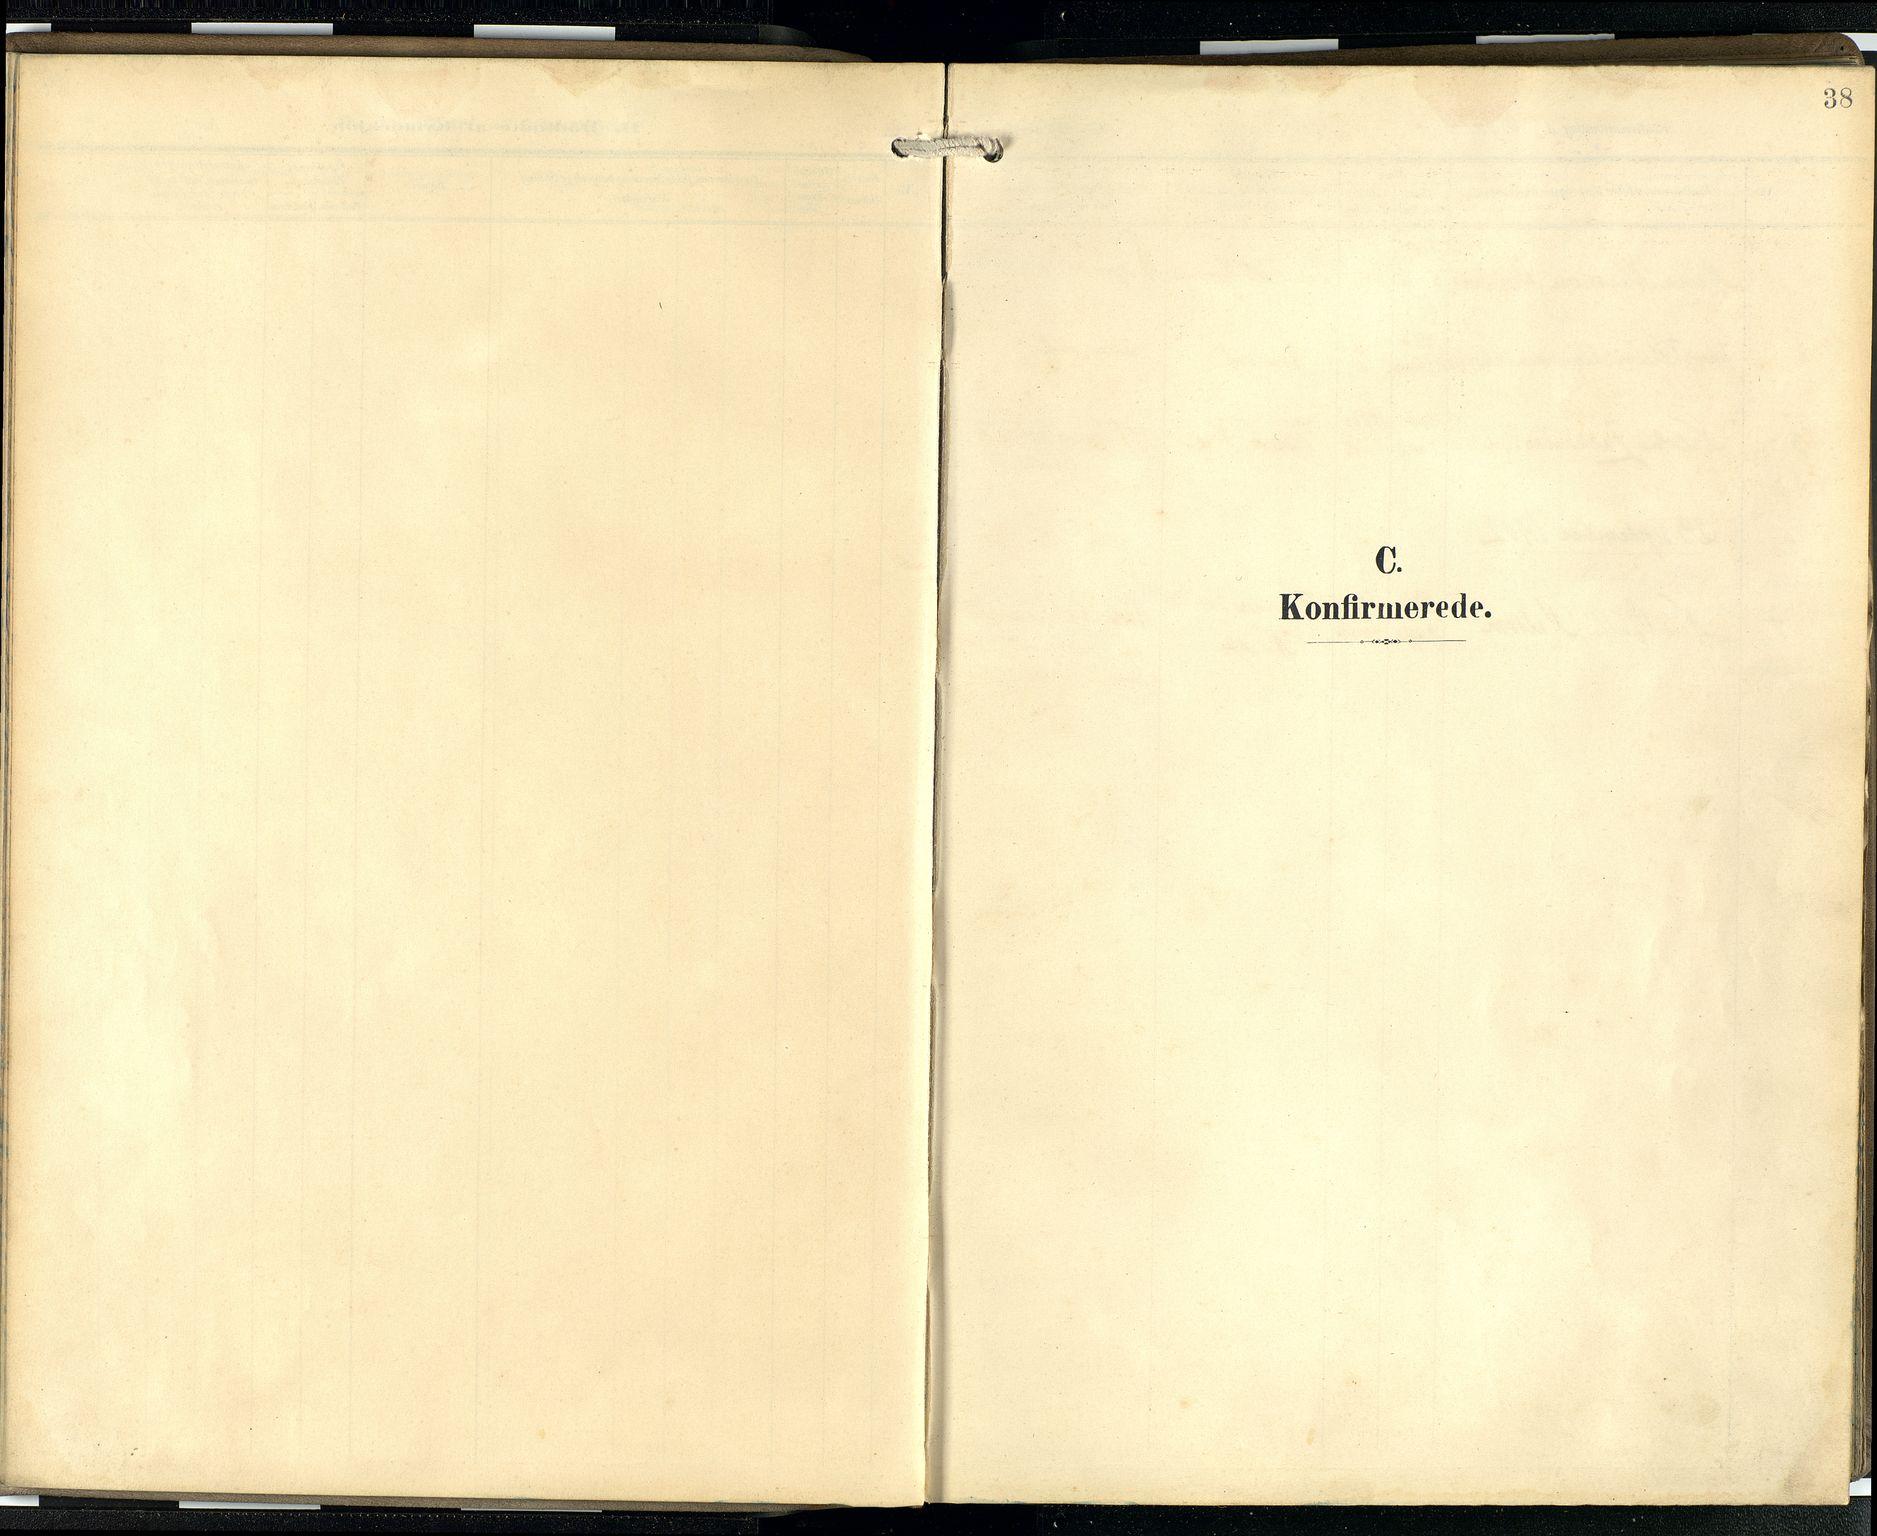 SAB, Privatarkiv 100 - Den norske sjømannsmisjon i utlandet/Skotske havner (Leith, Glasgow), H/Ha/Hab/L0001: Ministerialbok nr. A 1, 1902-1931, s. 37b-38a